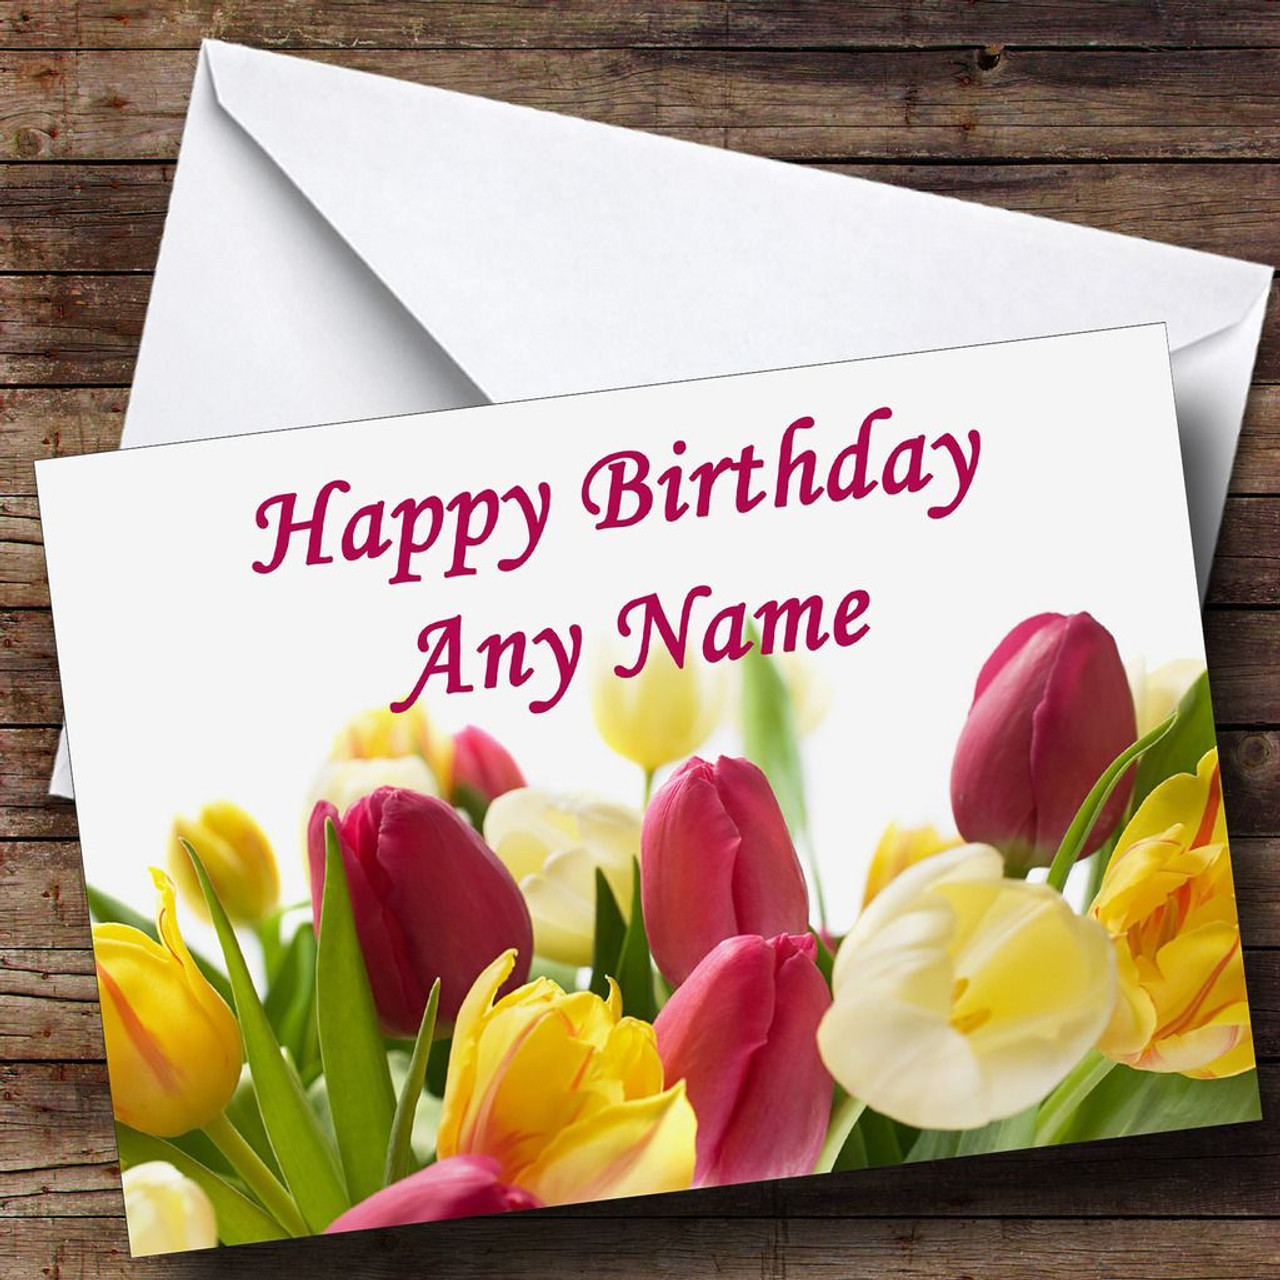 Personalised cards birthday cards flowers scenery nature tulip flowers personalised birthday card izmirmasajfo